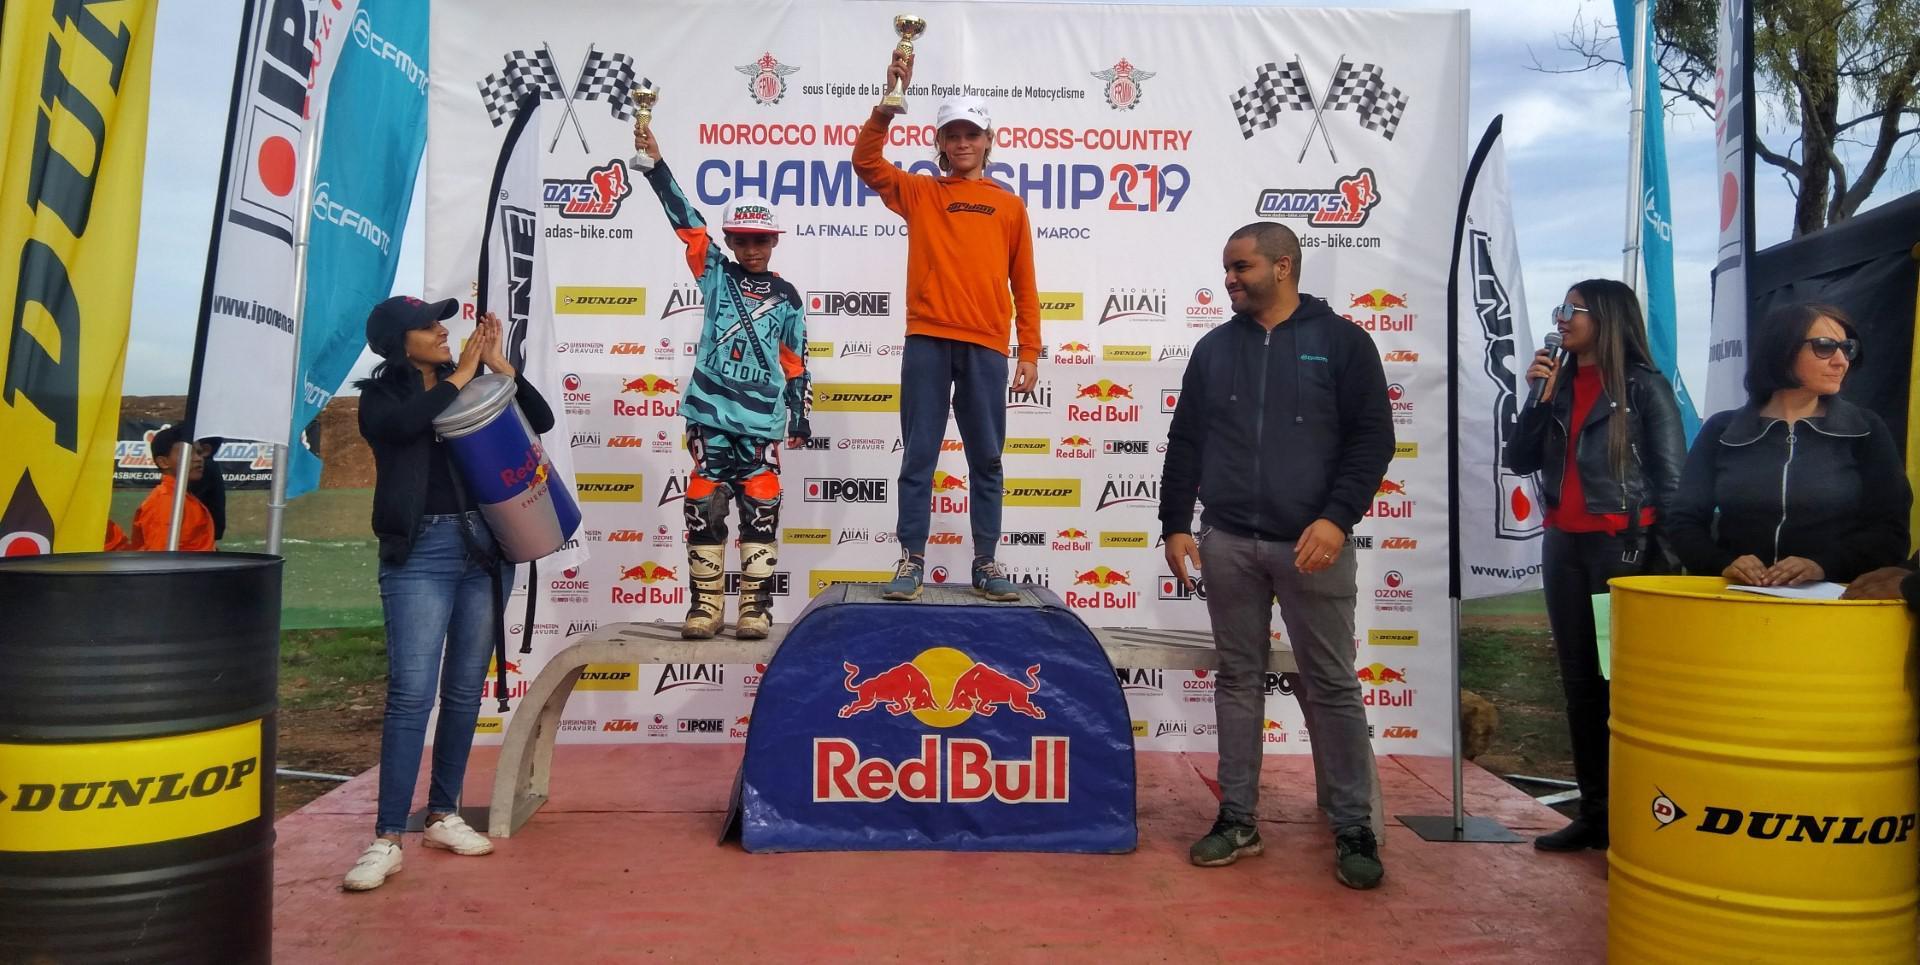 finale-du-championnat-du-maroc-de-motocross-et-cross-country-1164-6.jpg